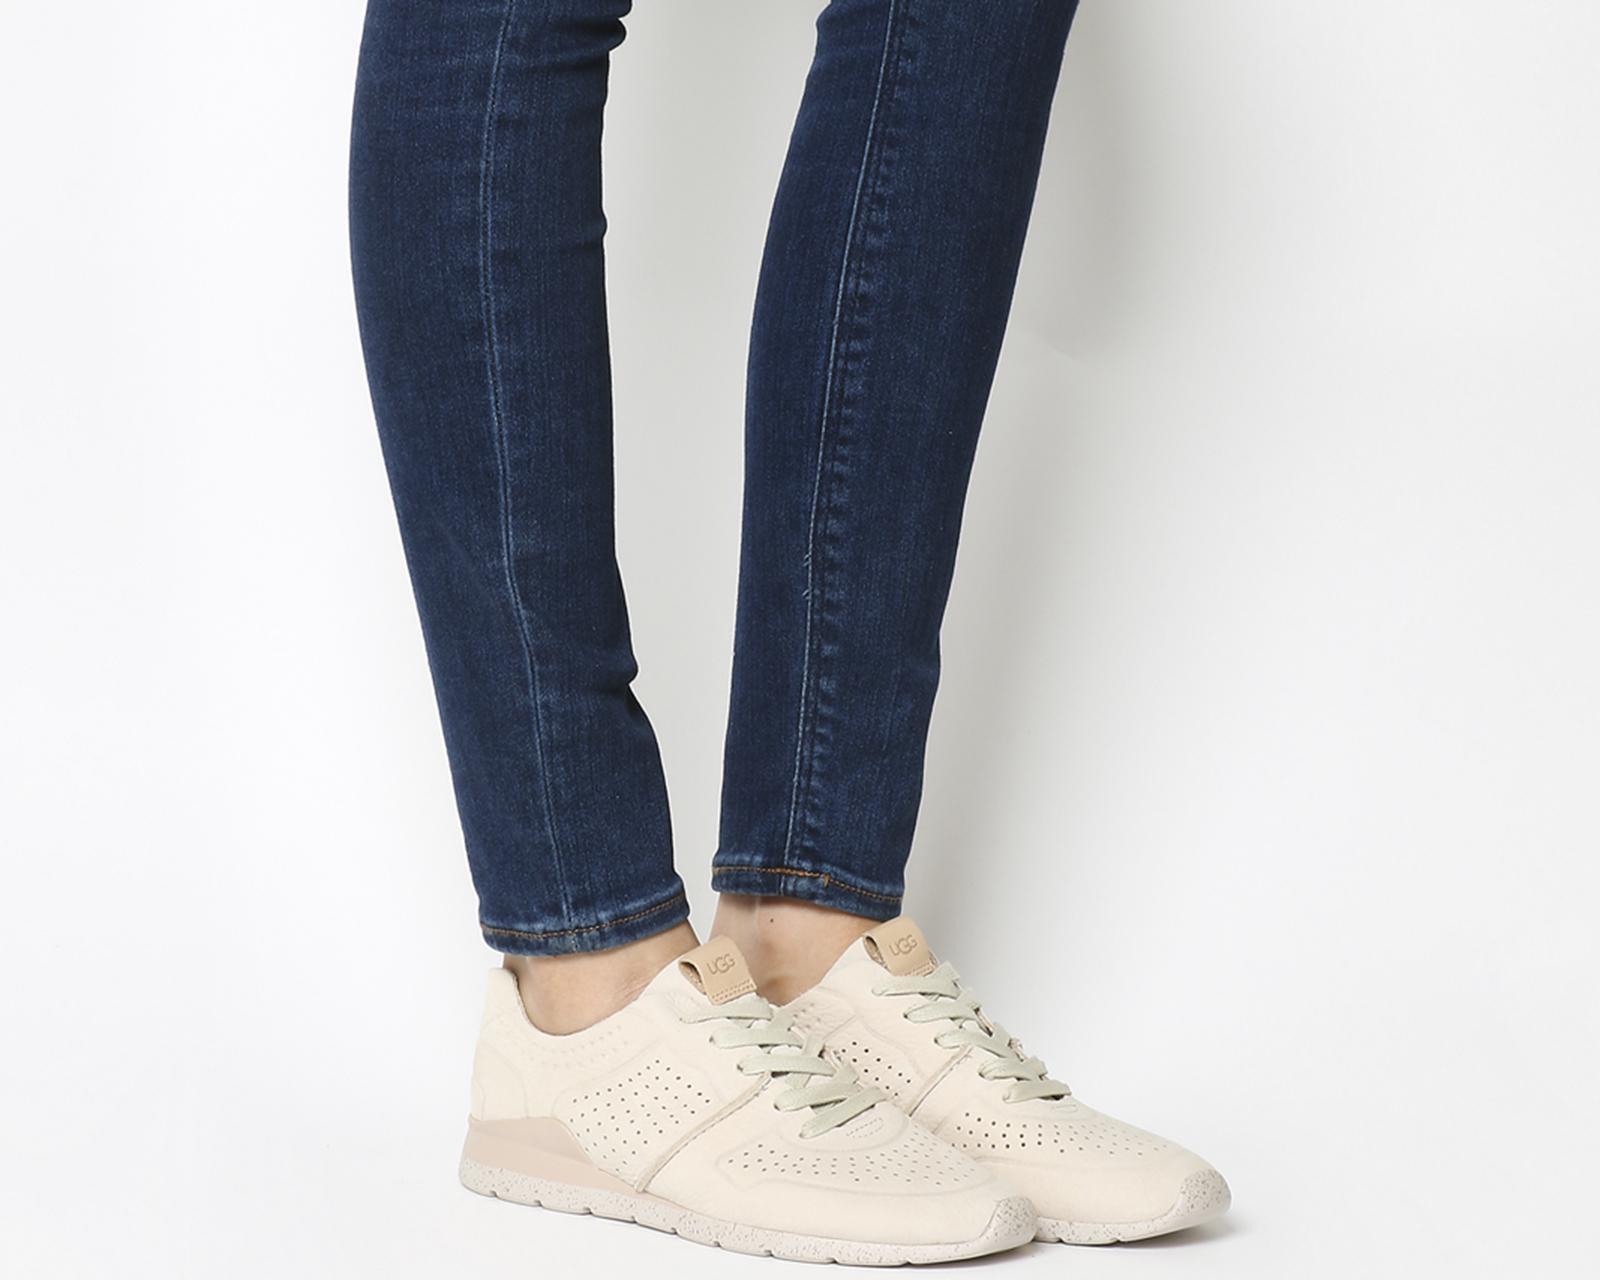 Ugg Multicolor Tye Sneakers